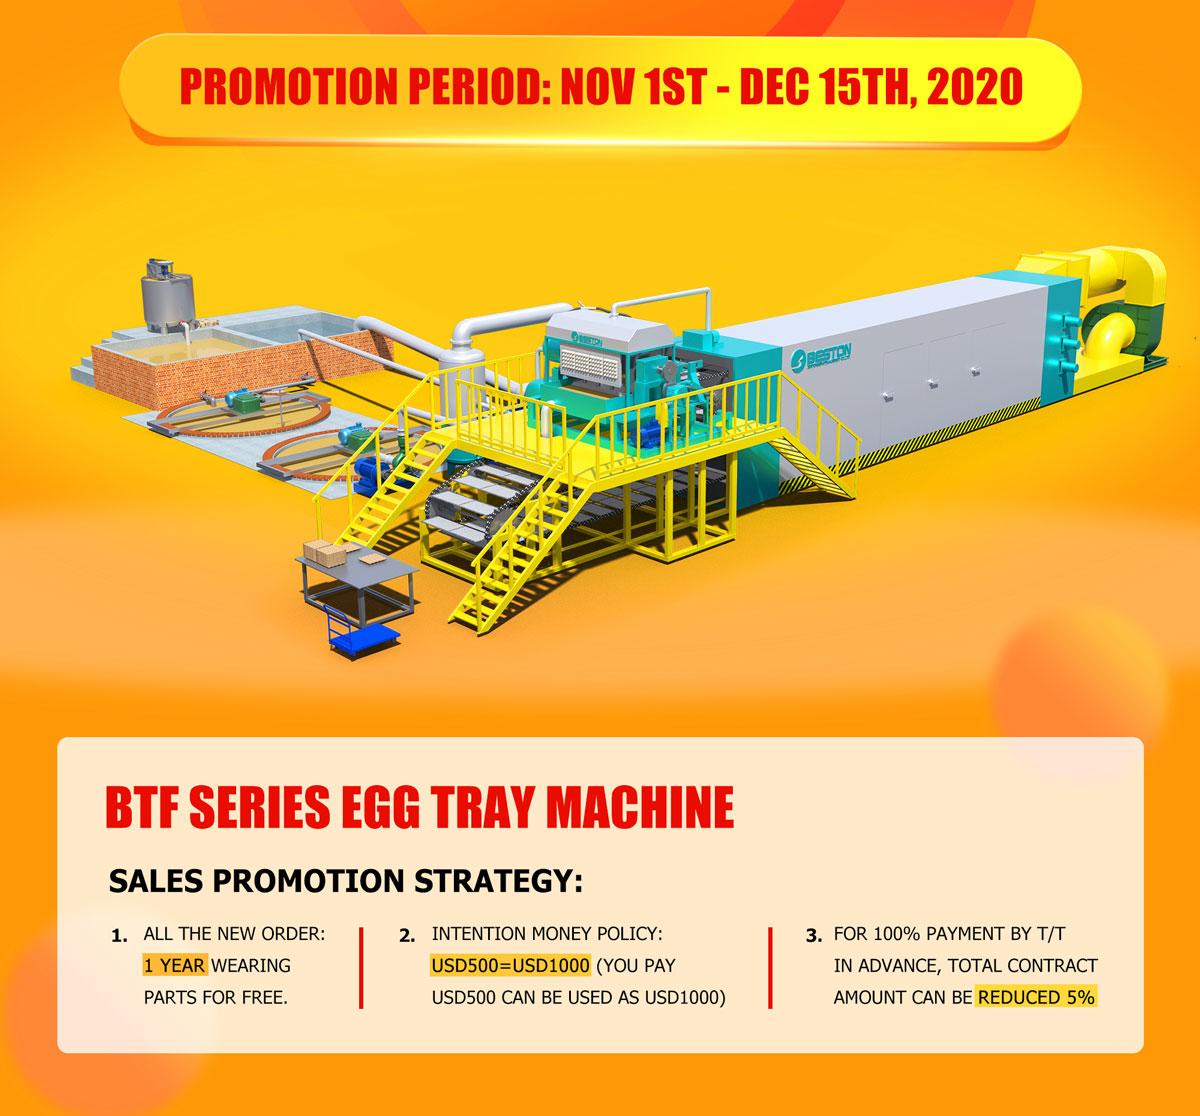 Beston Egg Tray Machine Promotion